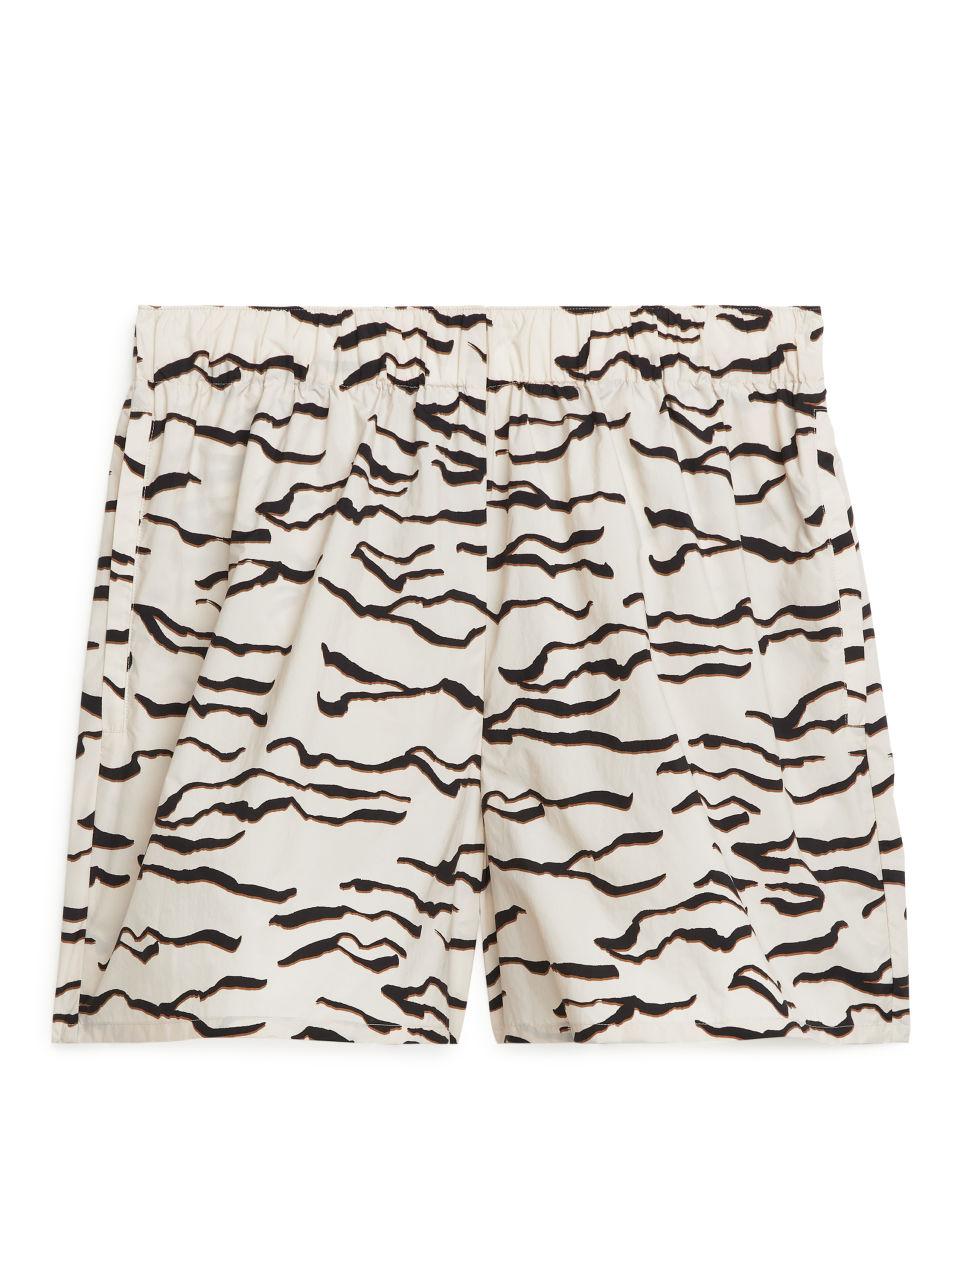 Printed Nylon Shorts - Beige